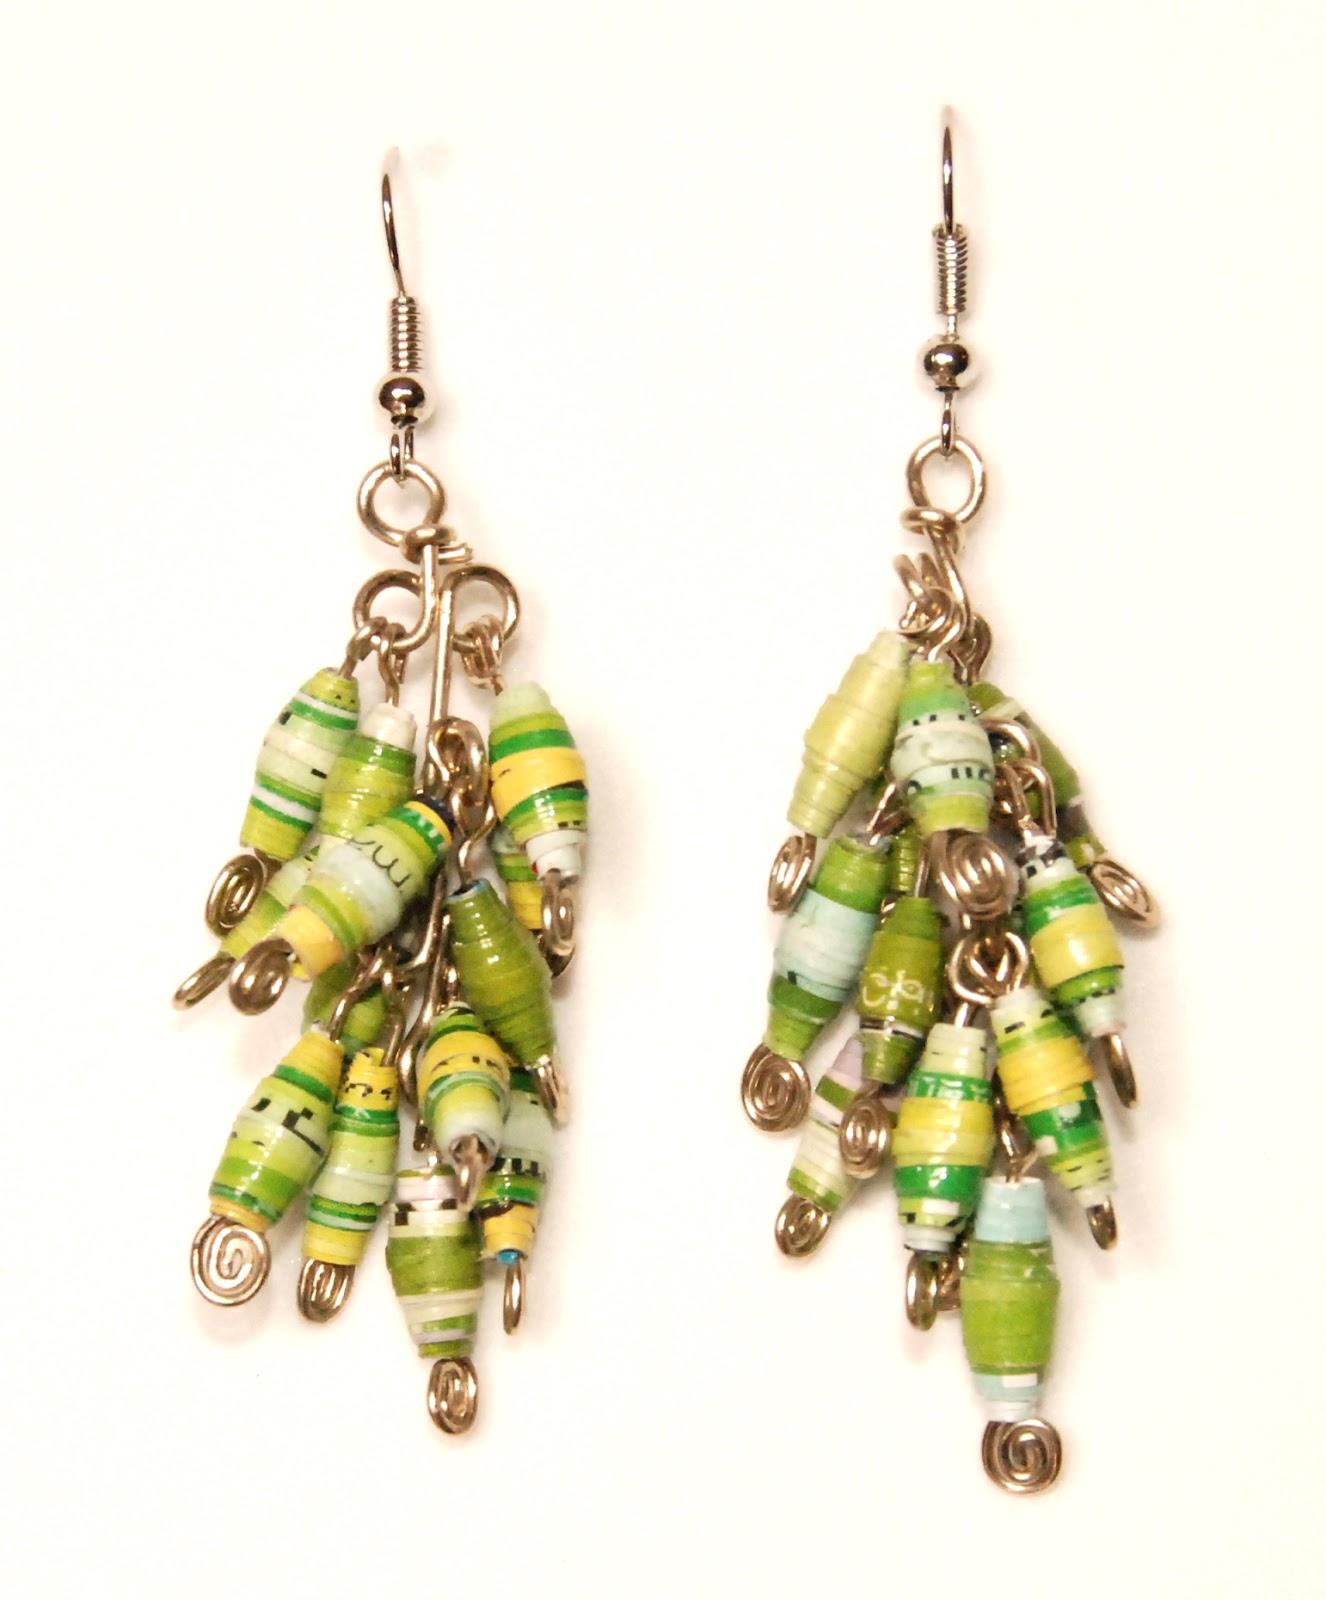 http://4.bp.blogspot.com/-vlo1wK1VuwE/T_lwS0O66zI/AAAAAAAATxc/xUSHerht5Uc/s1600/paper+bead+earrings.jpg